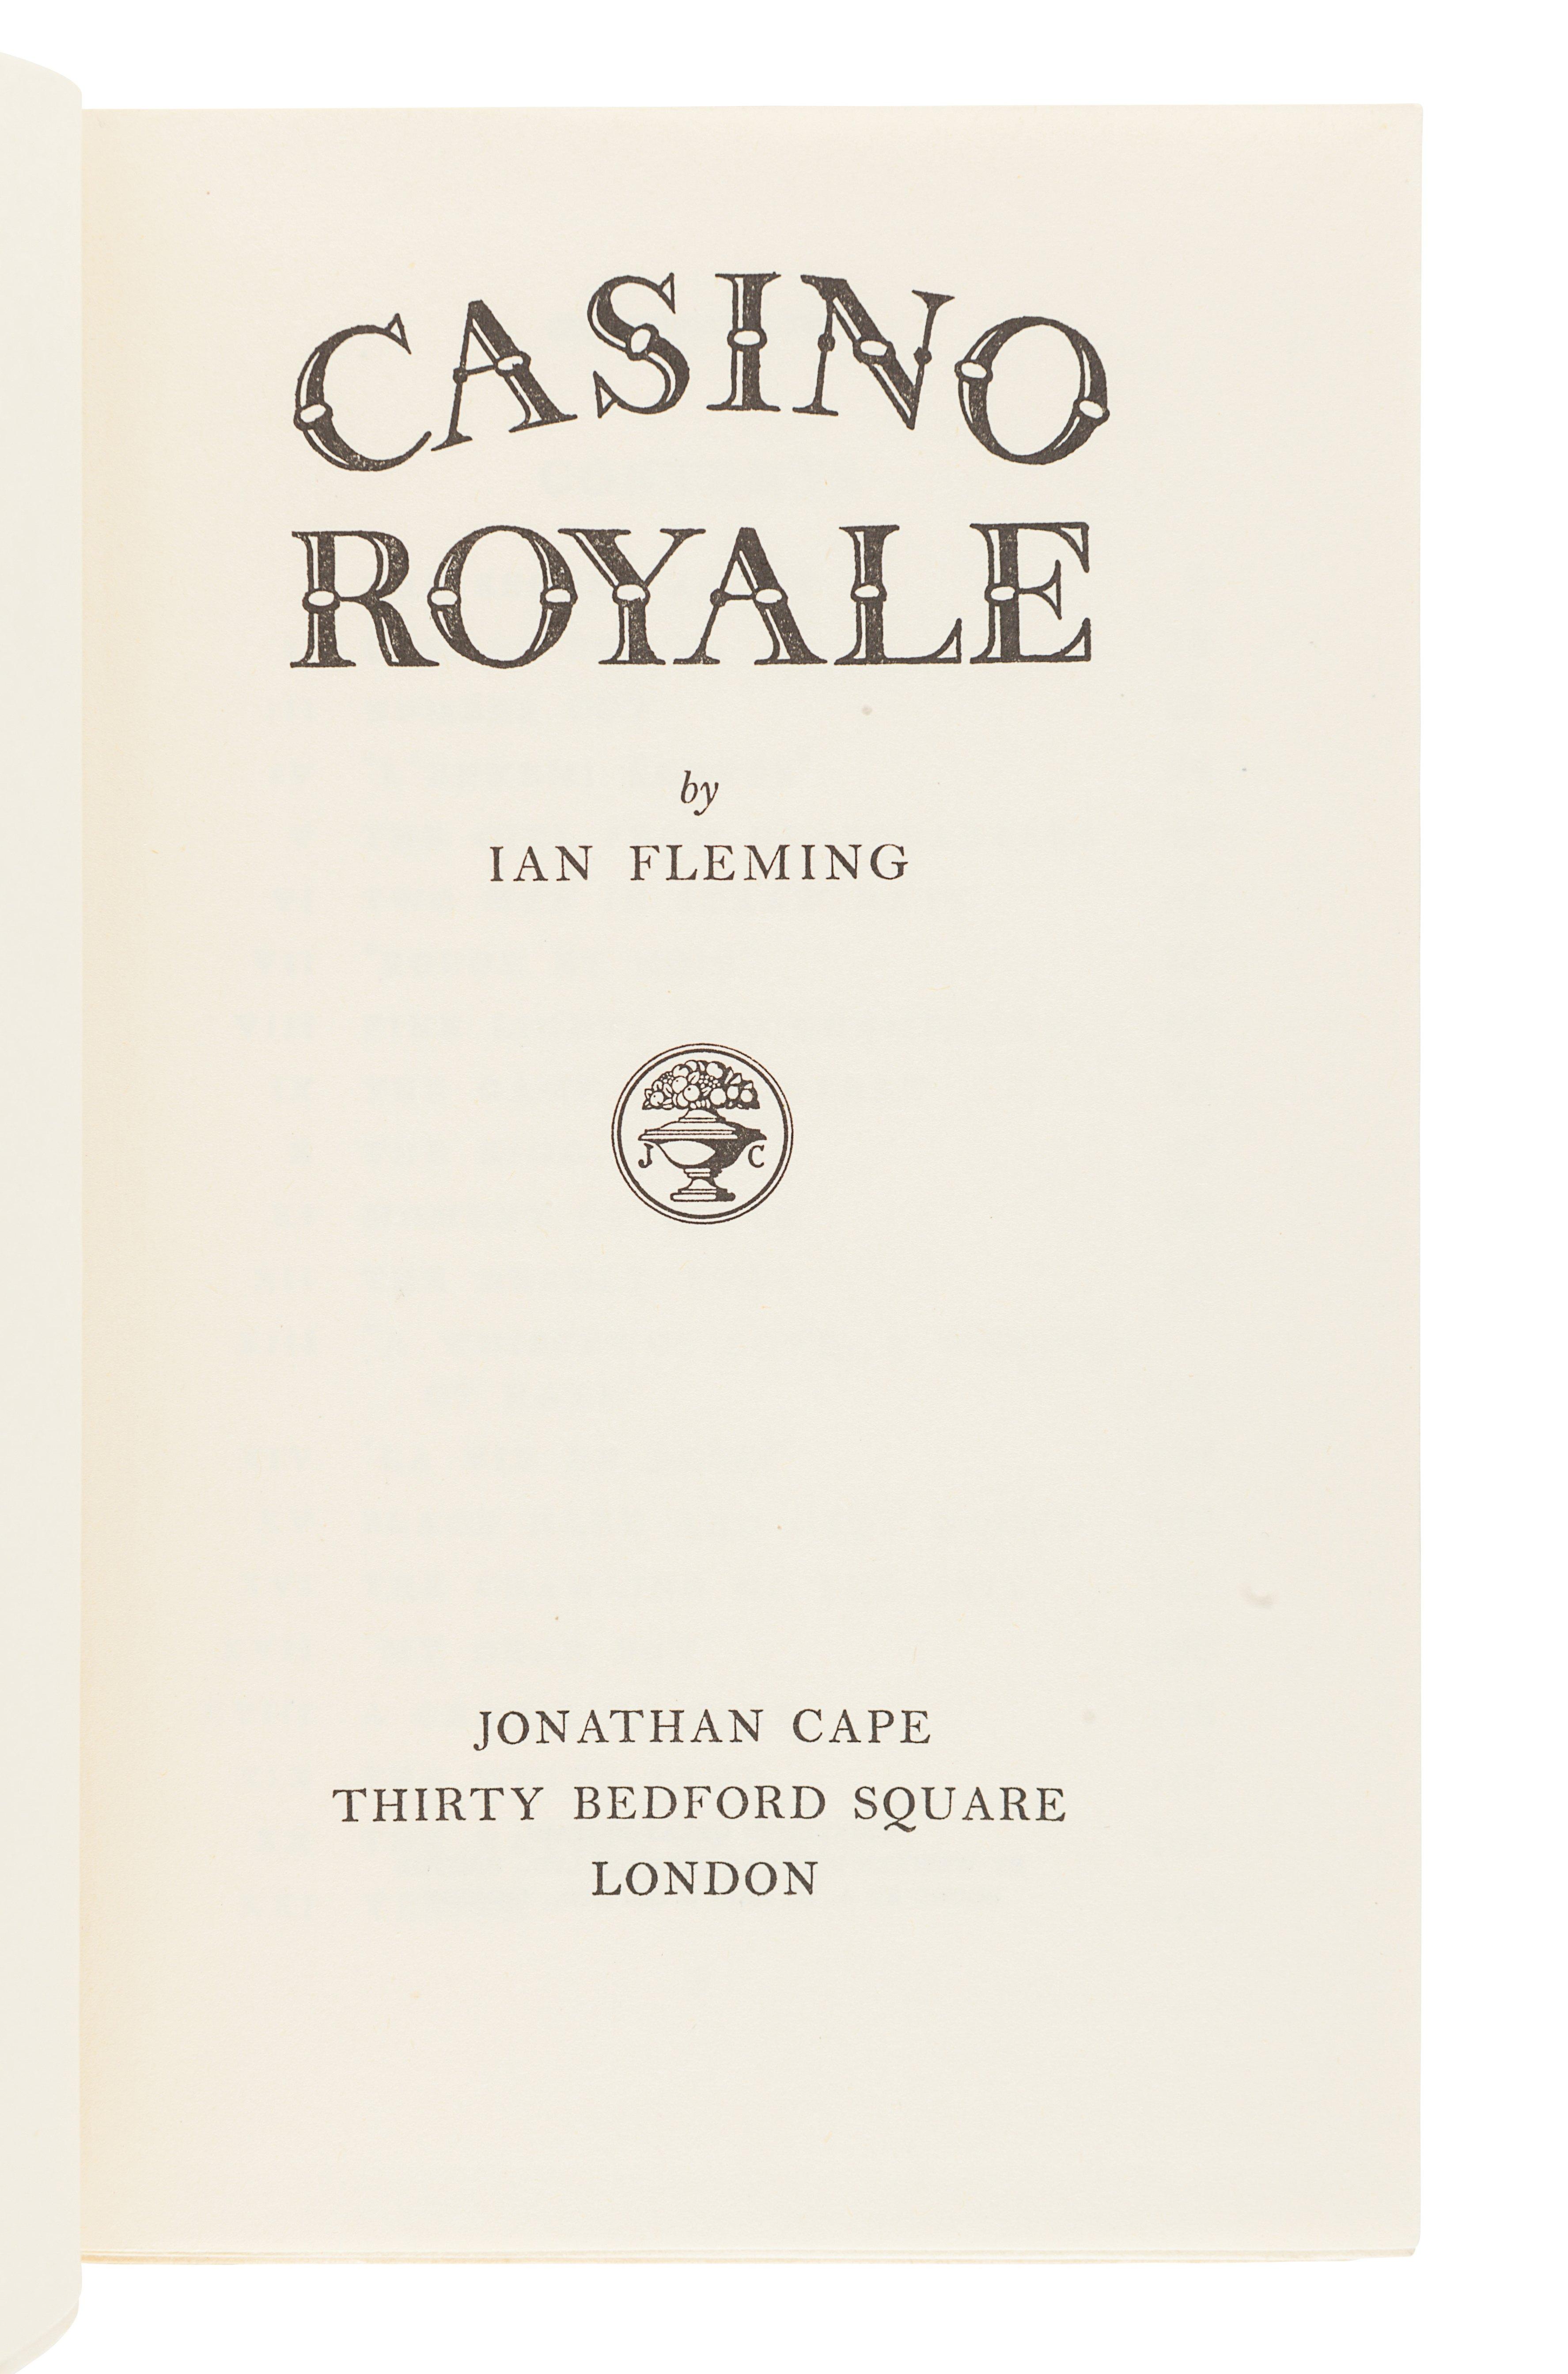 FLEMING, Ian (1908-1964). Casino Royale. London: Jonathan Cape, 1953. - Image 2 of 2